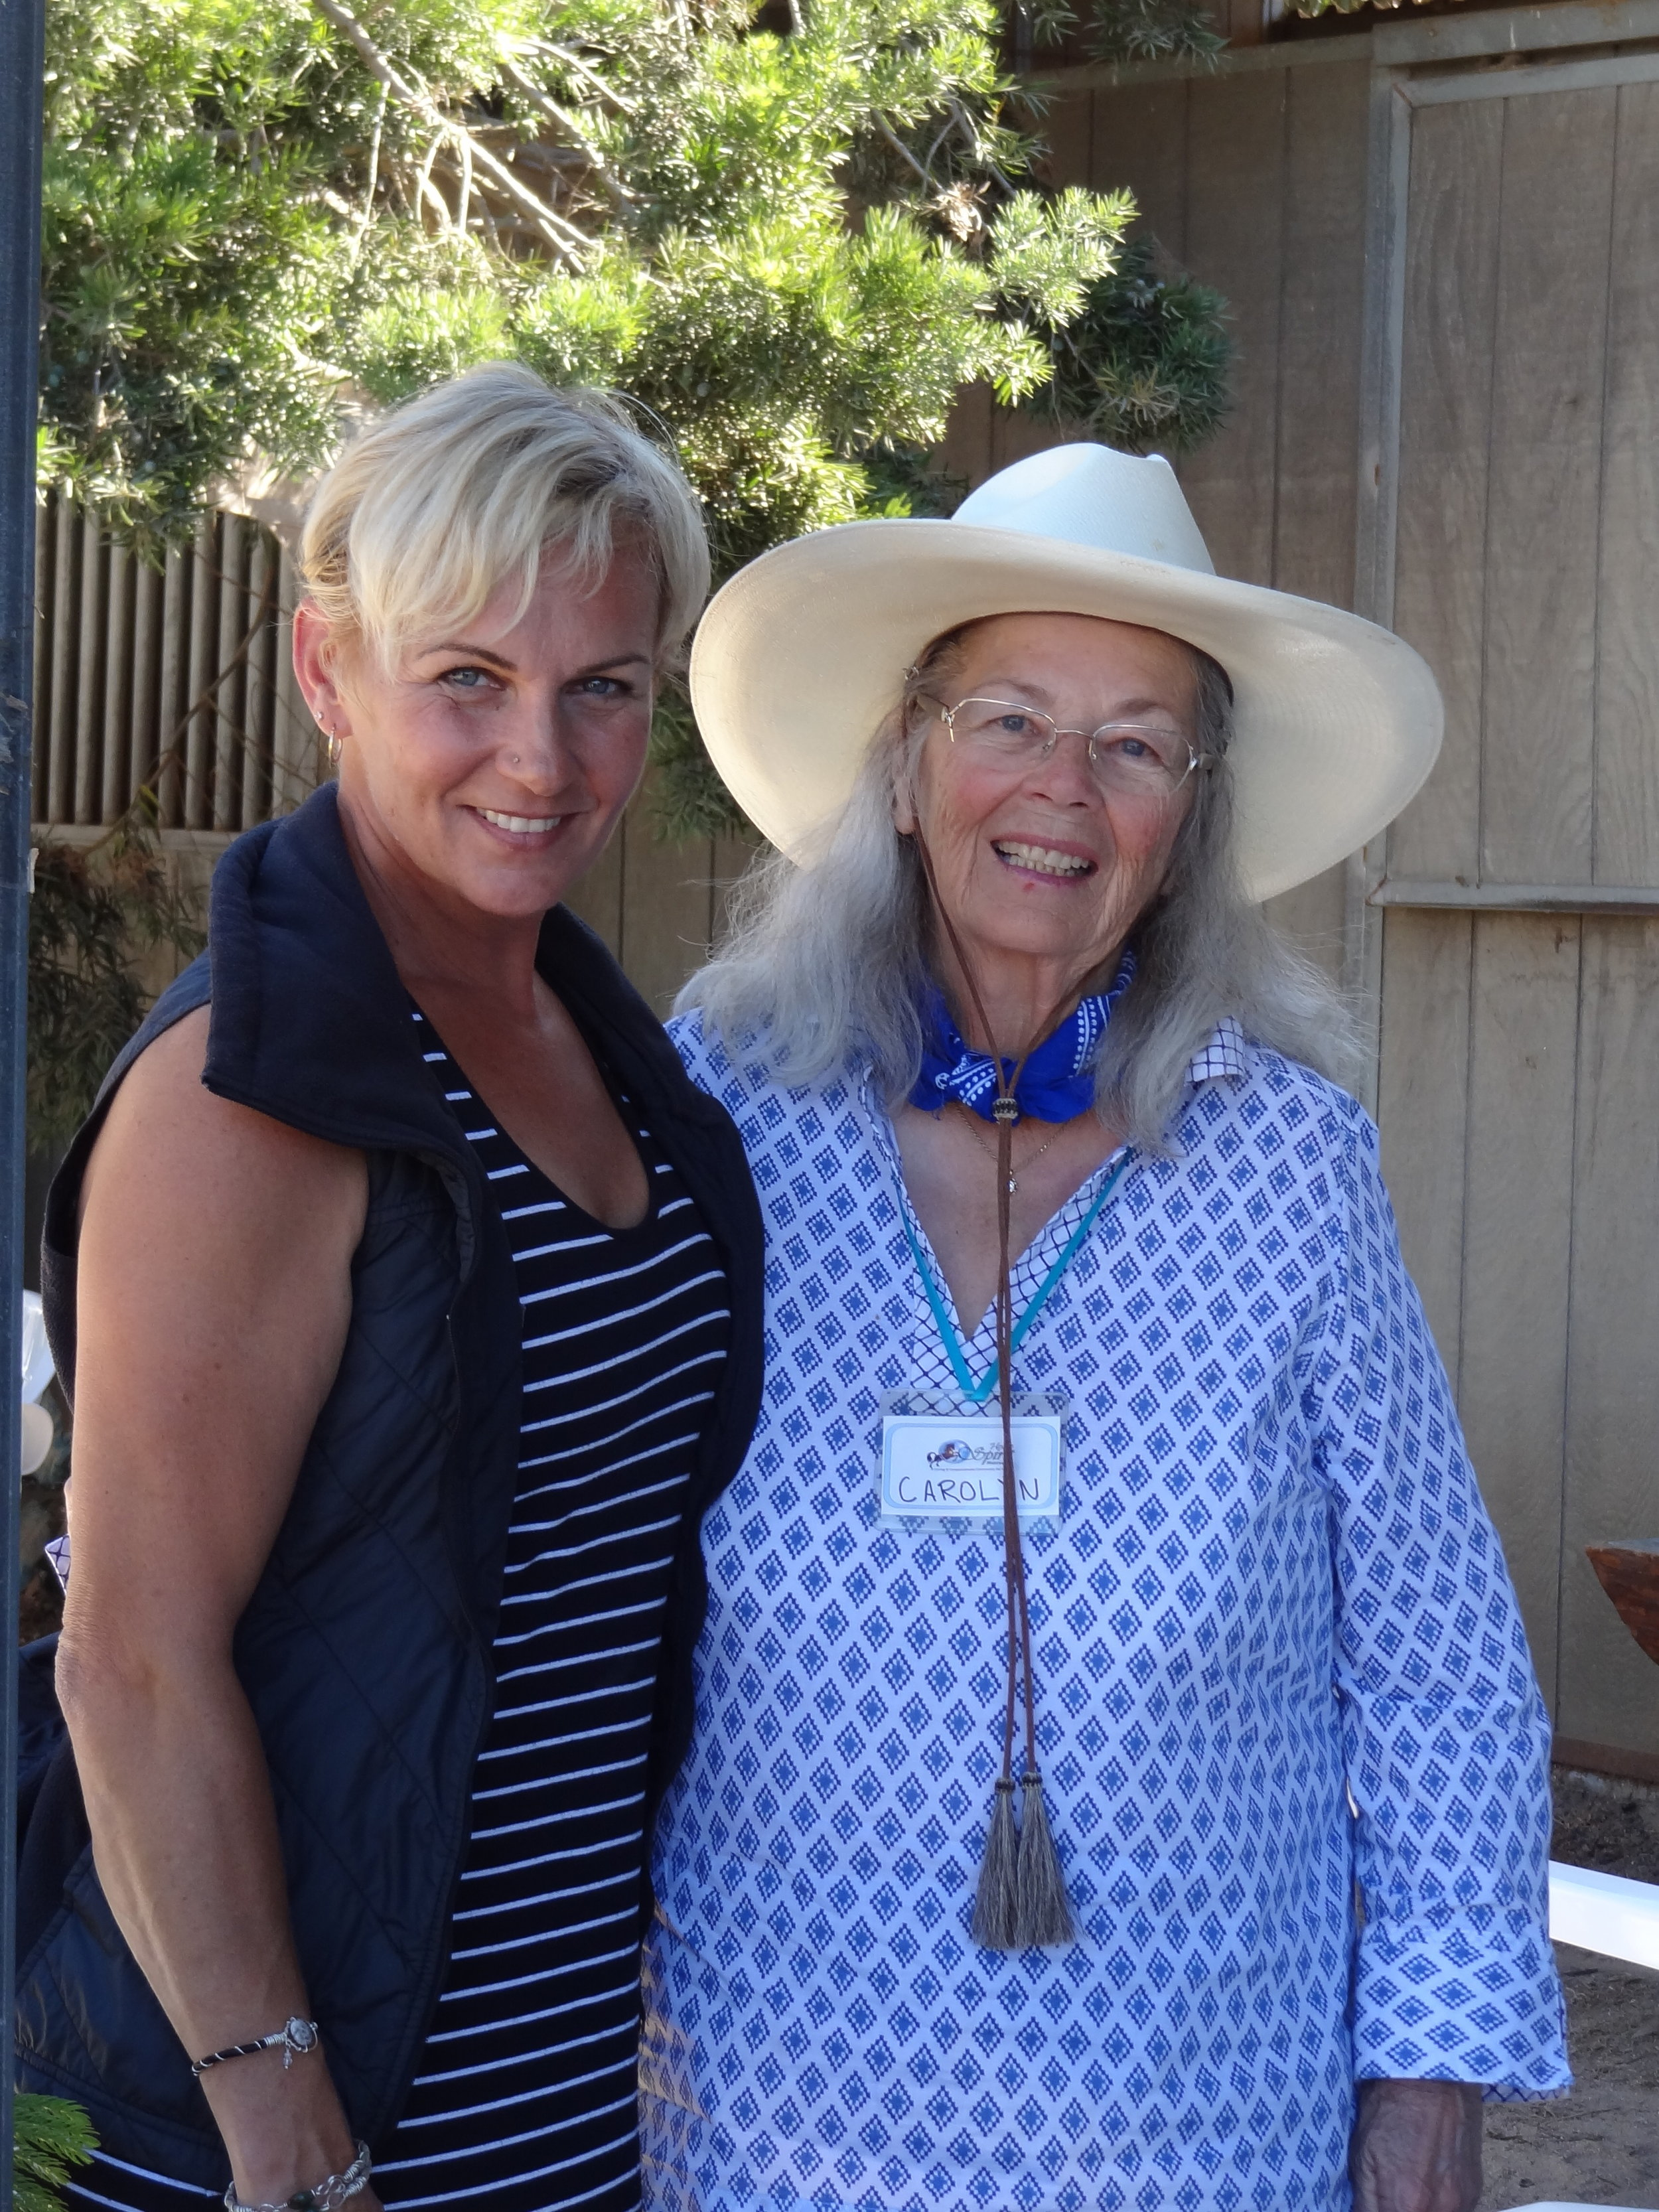 Carolyn Resnick, Sylvia Zerbini. Photo by Lori Brown Smith.JPG